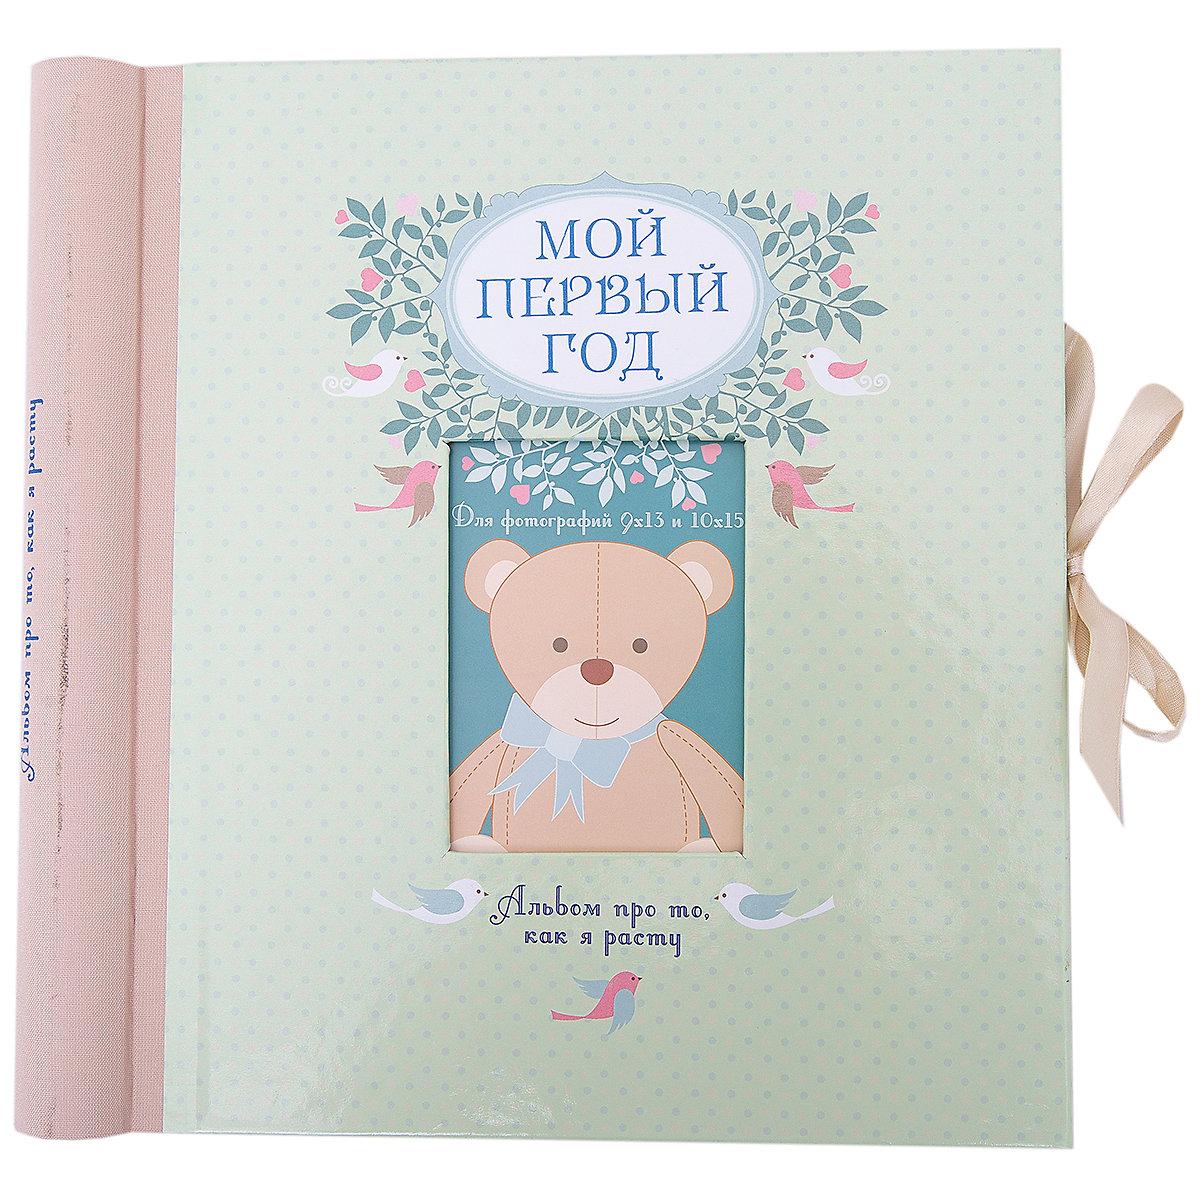 Books EKSMO 7367601 Children Education Encyclopedia Alphabet Dictionary Book For Baby MTpromo